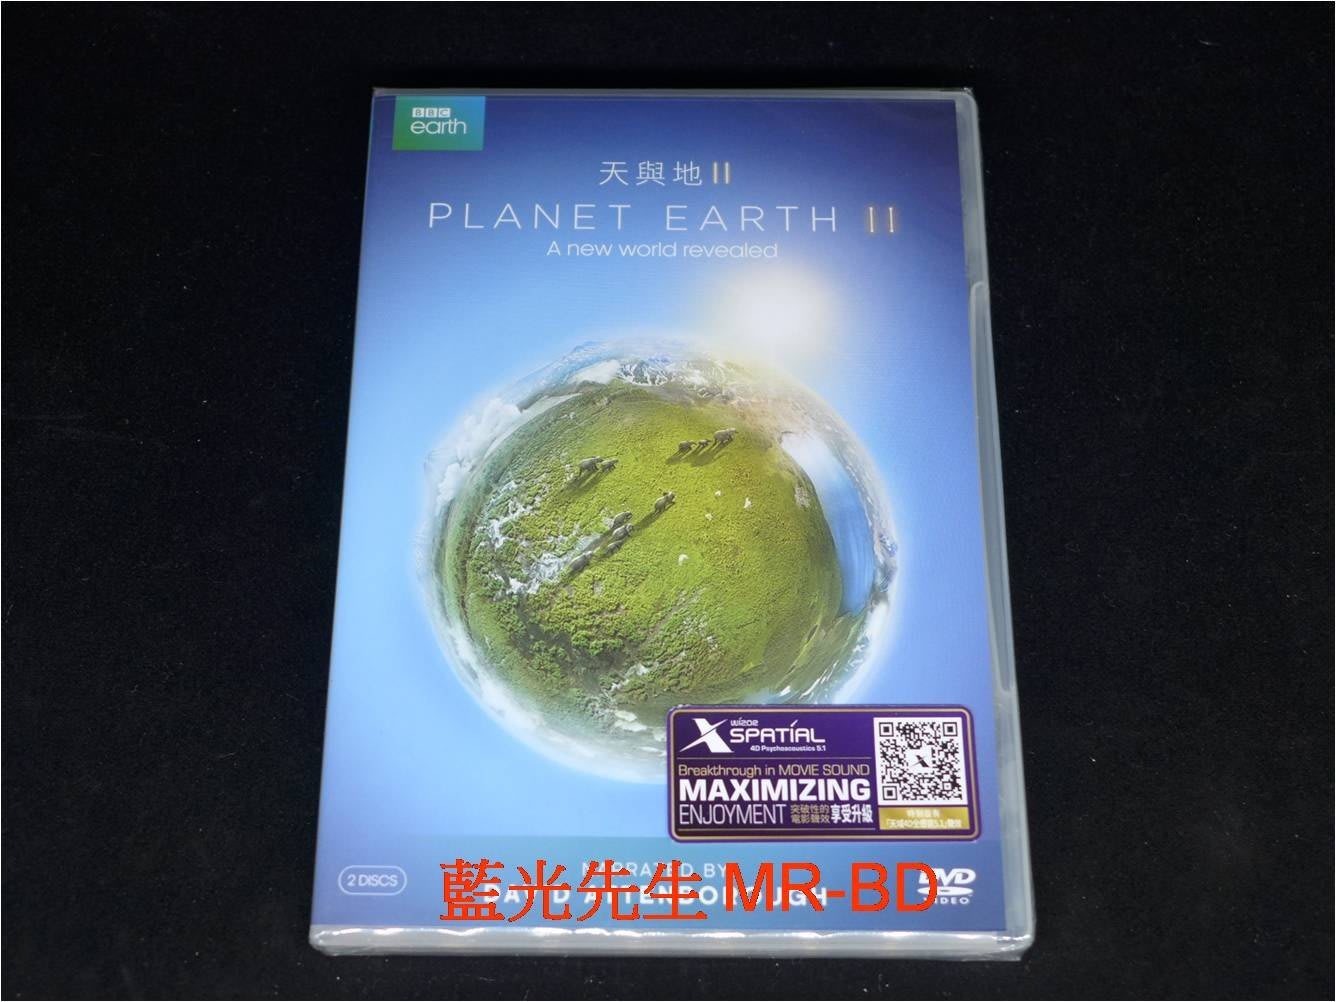 [DVD] - 地球脈動2 ( 天與地 II ) Planet earth II 雙碟版 - 天域 4D 全感音 聲效